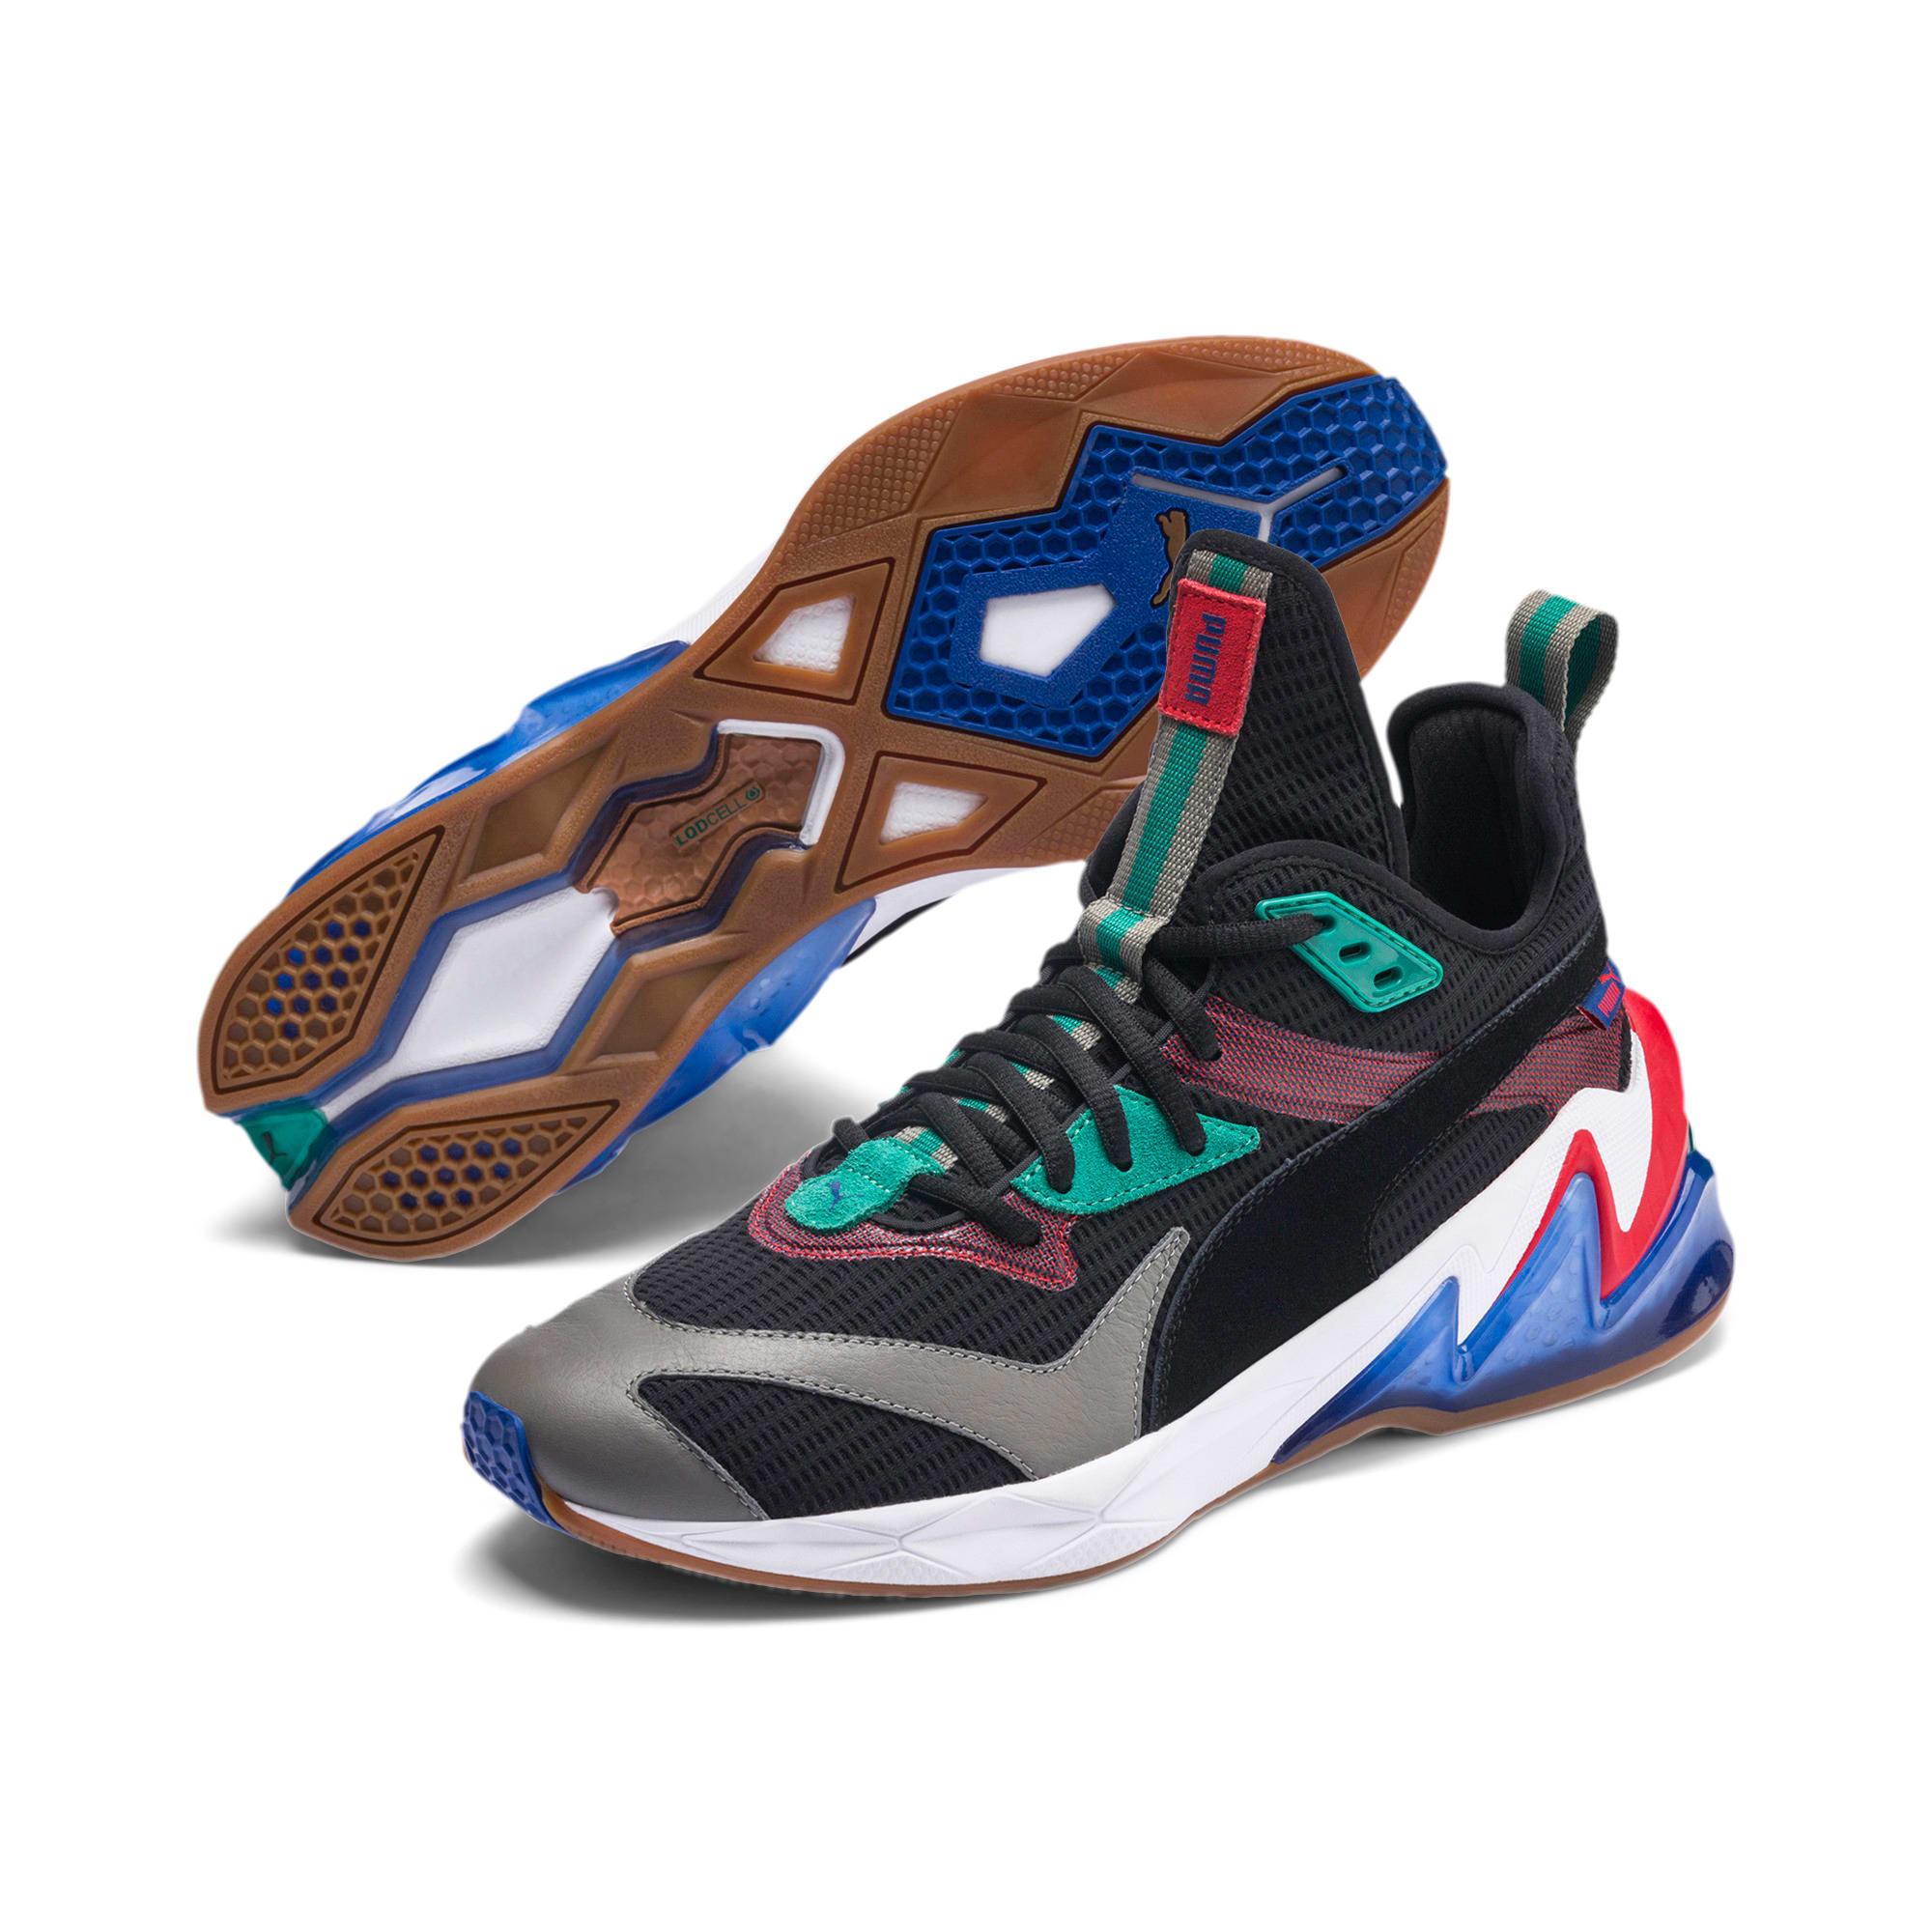 Thumbnail 2 of LQDCELL Origin Herren Sneaker, Puma Black-Cadmium Green, medium